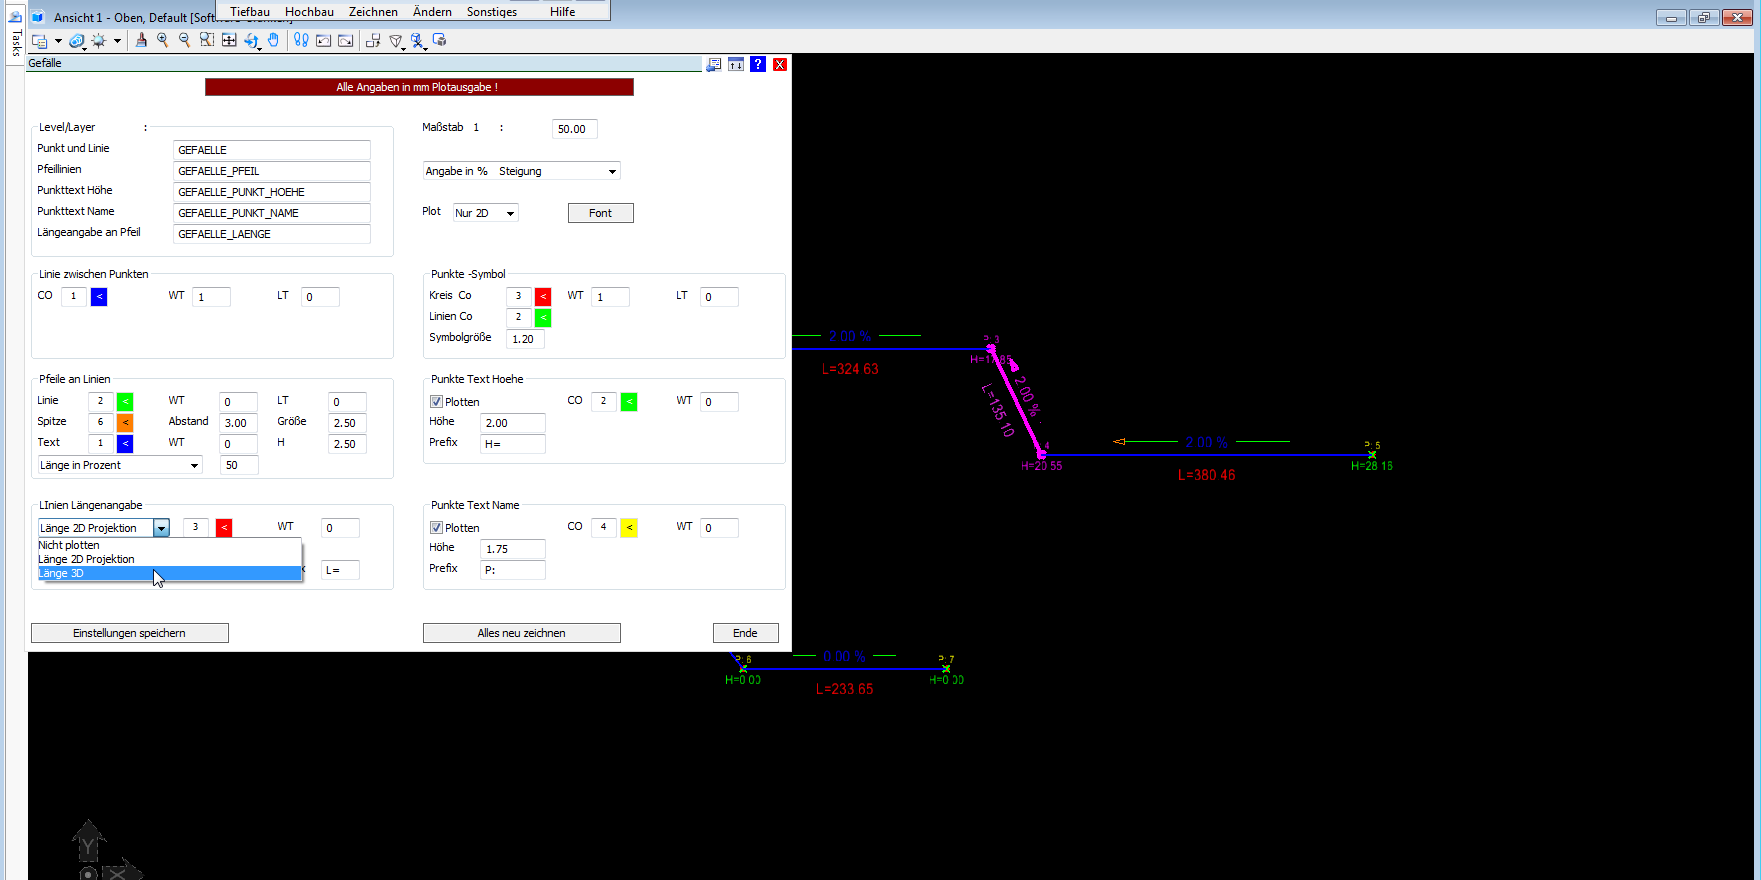 Entwässerungsplan AutoCAD BricsCAD MicroStation